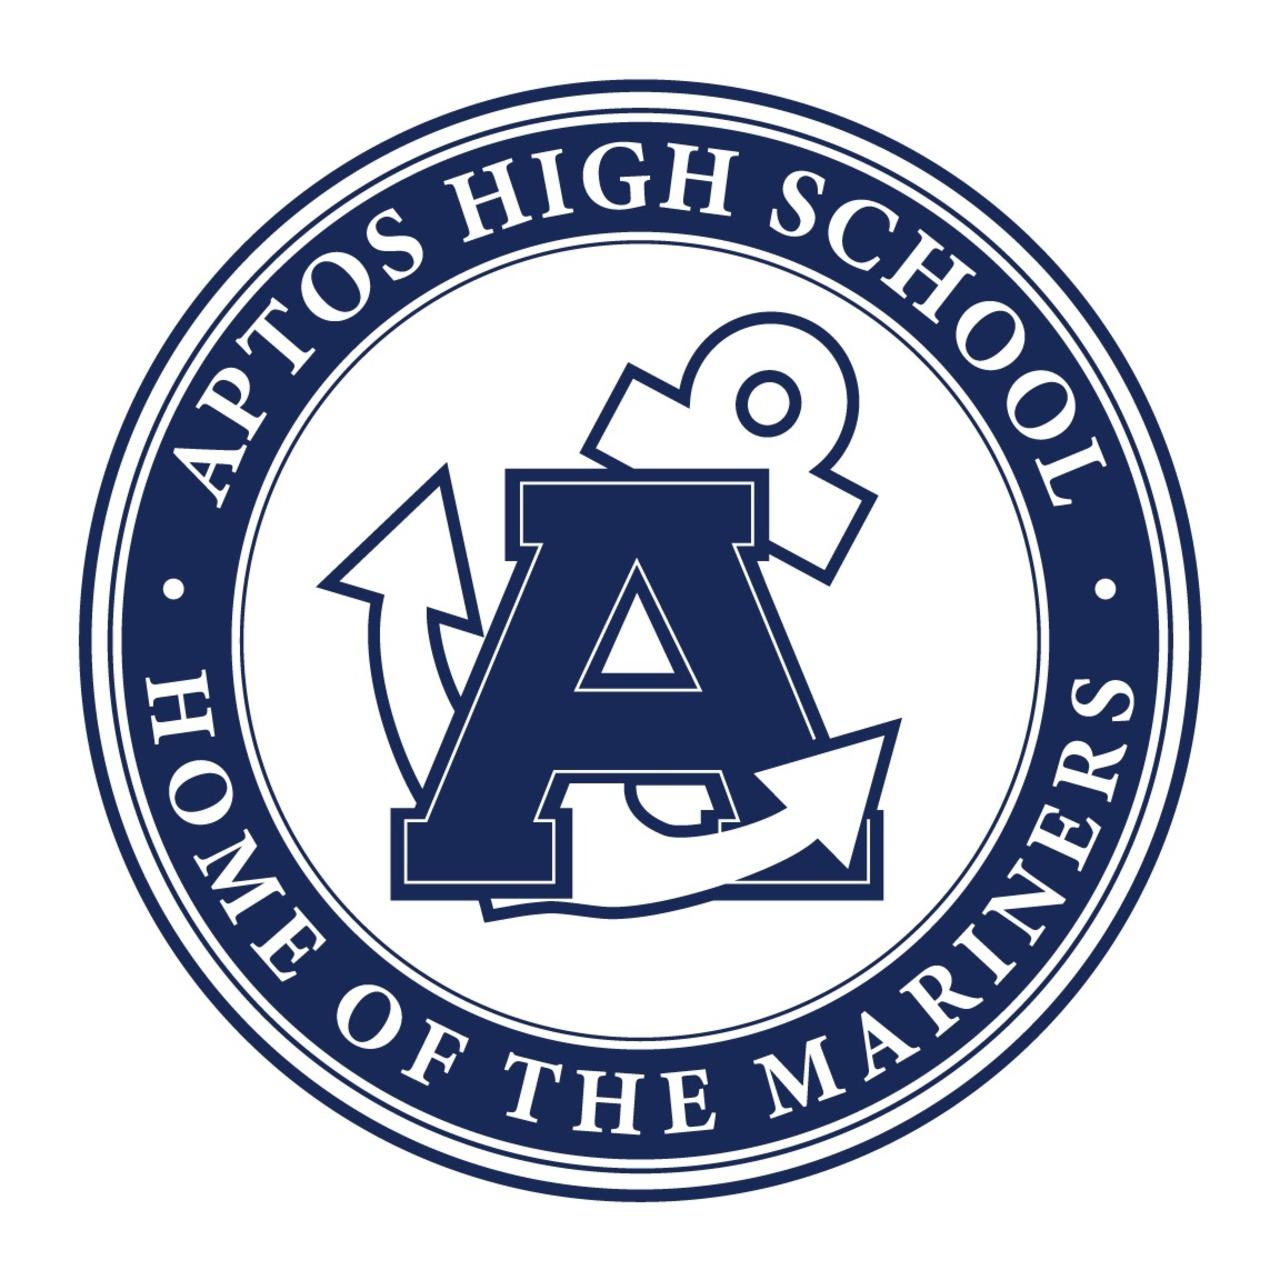 Aptos High School Team!